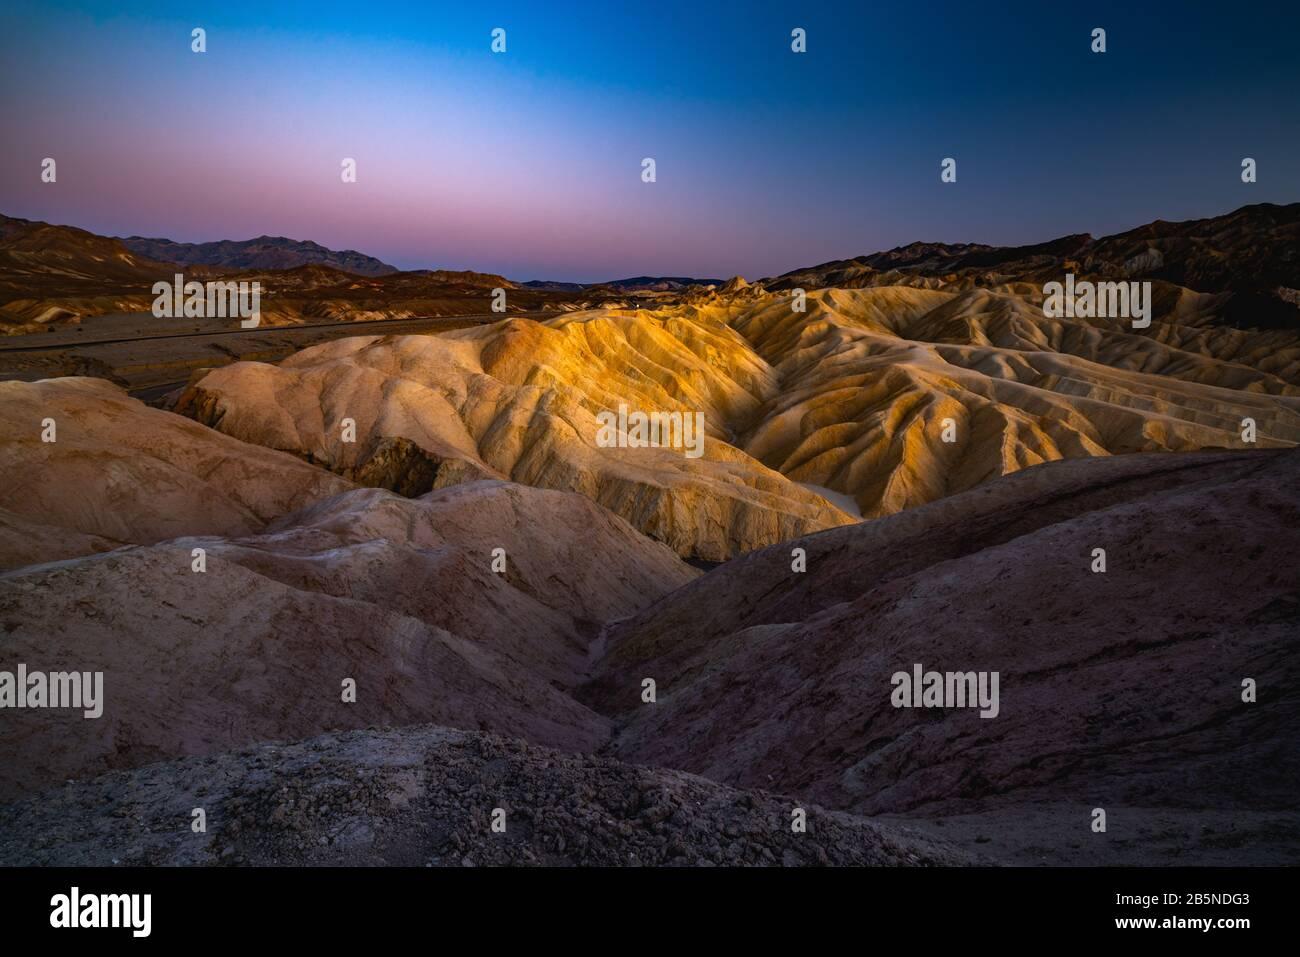 The Badlands, Zabriskie Point Loop in Death Valley National Park, California Stock Photo